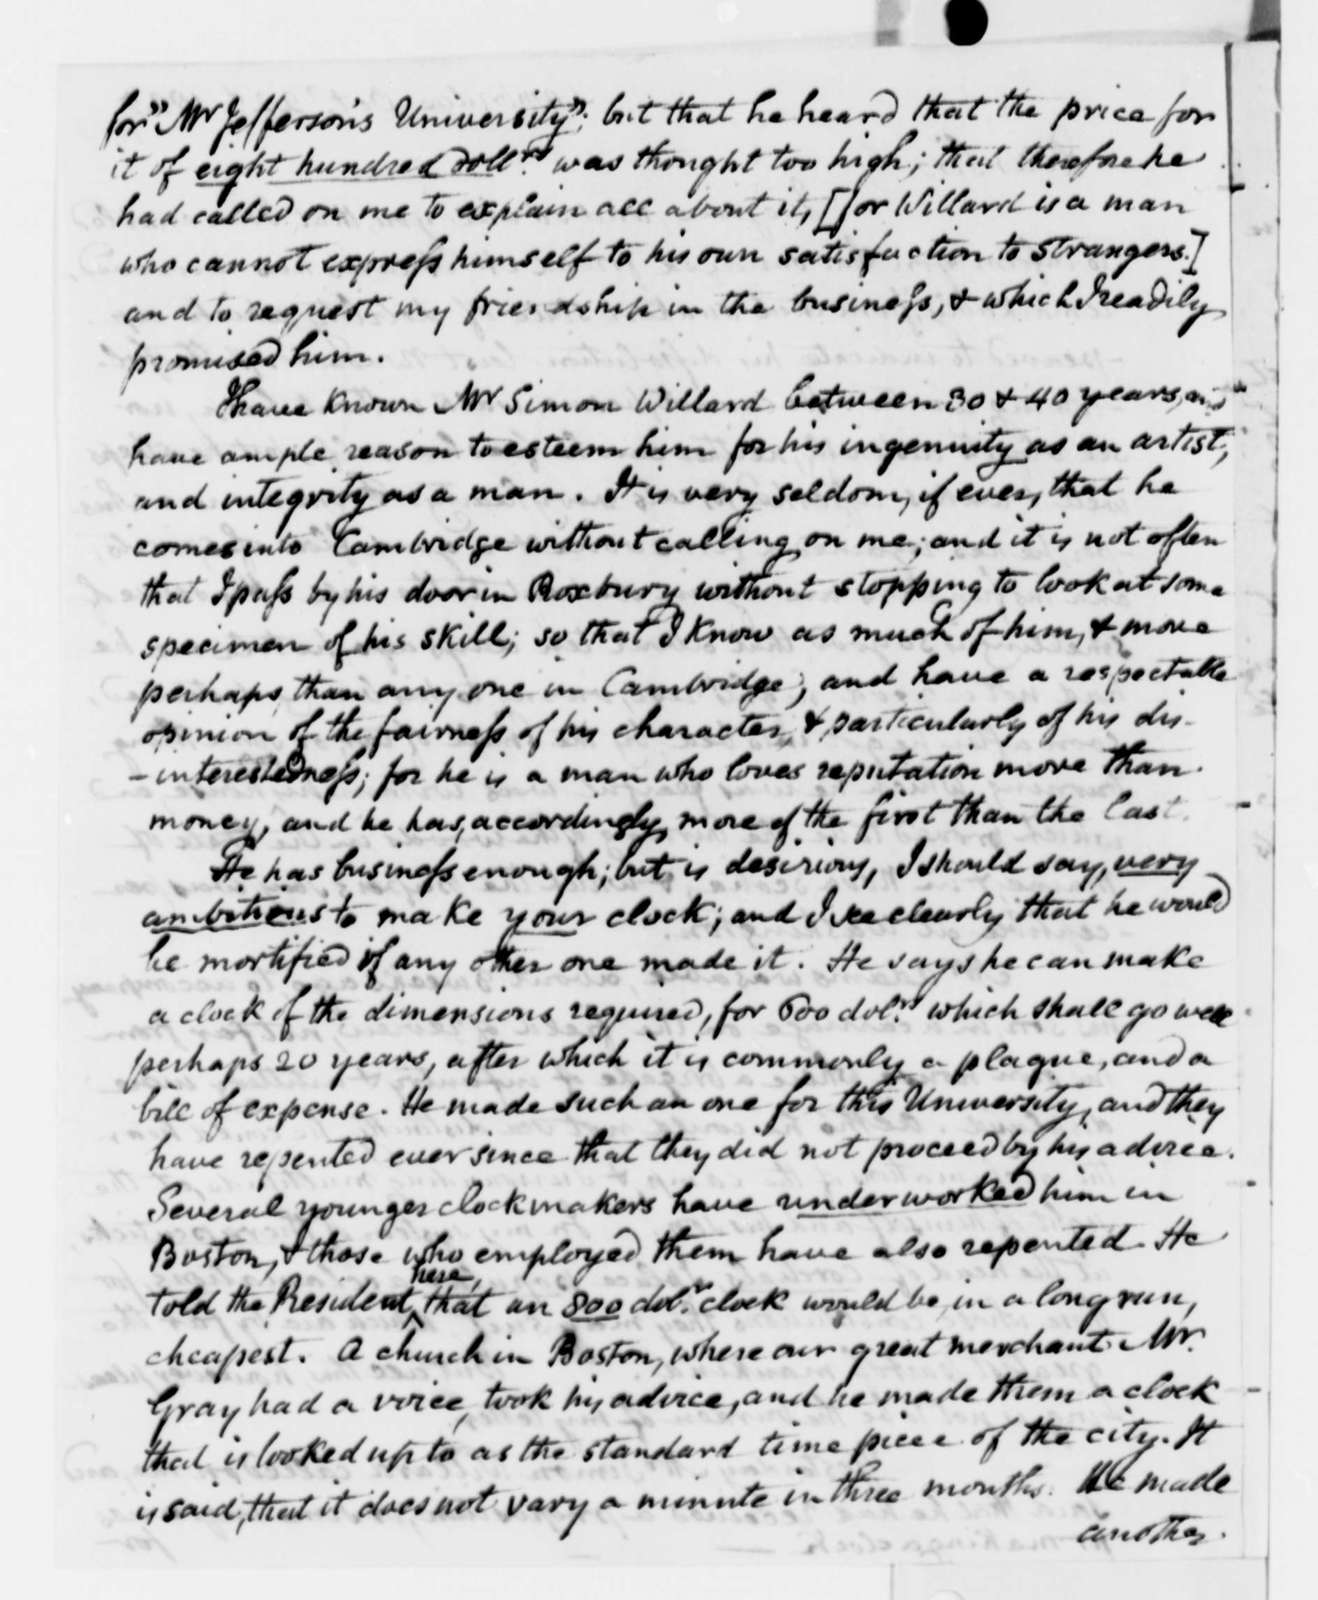 Benjamin Waterhouse to Thomas Jefferson, October 22, 1825